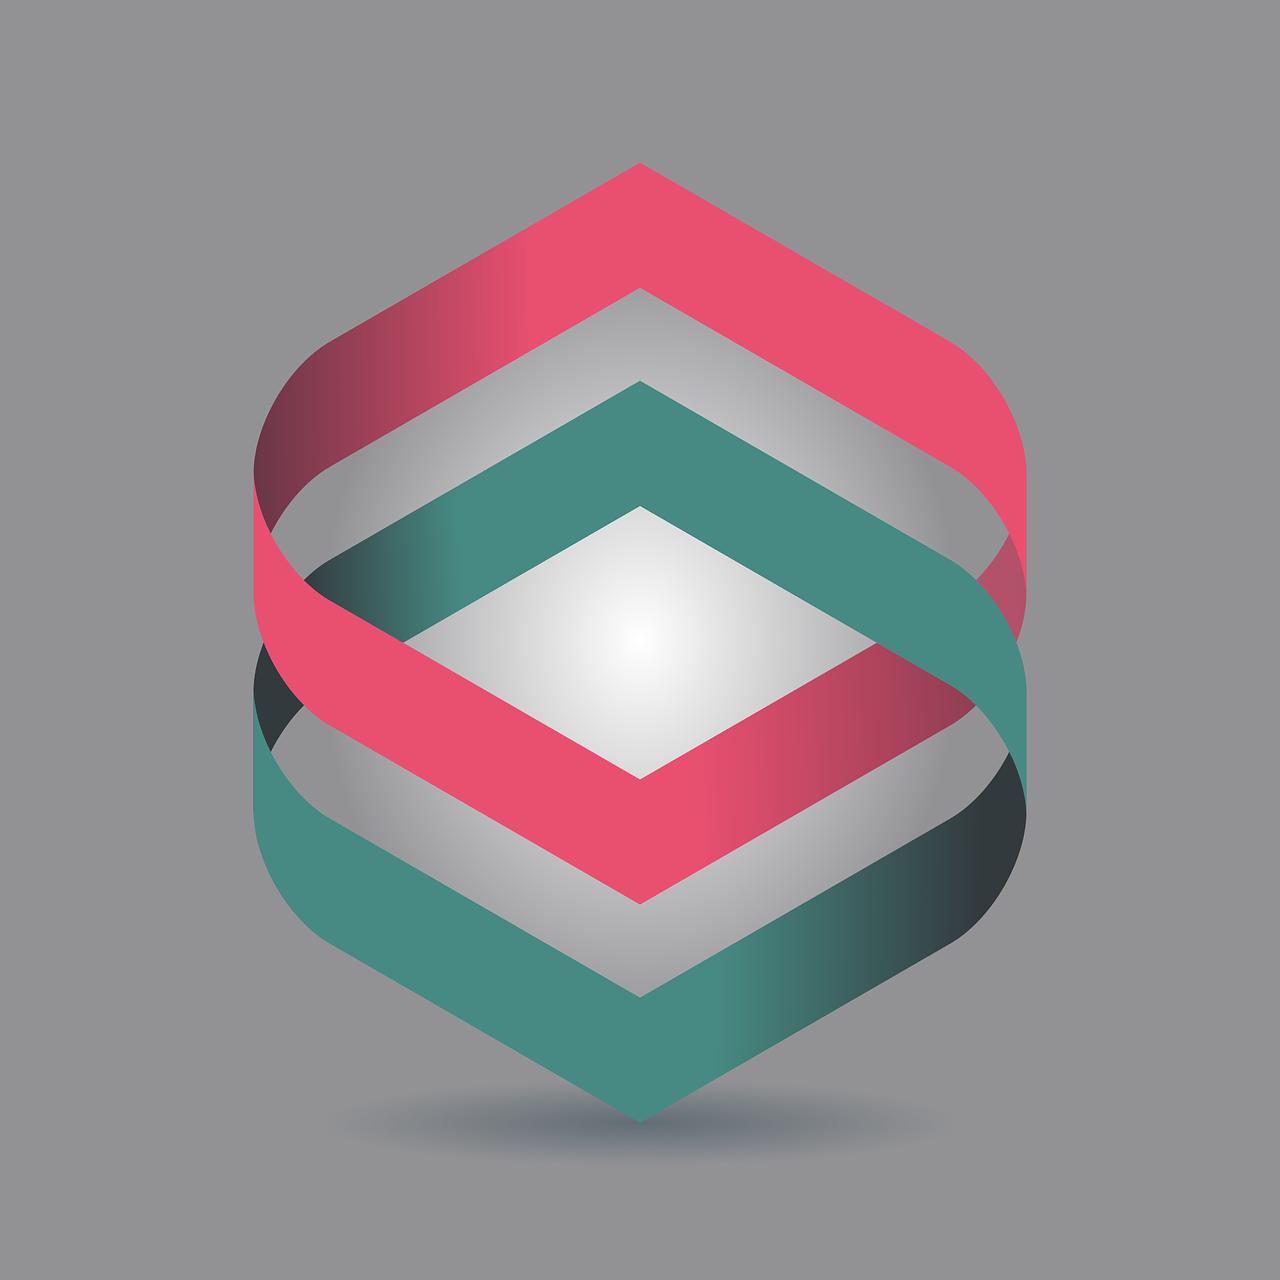 How to design a logo for free?